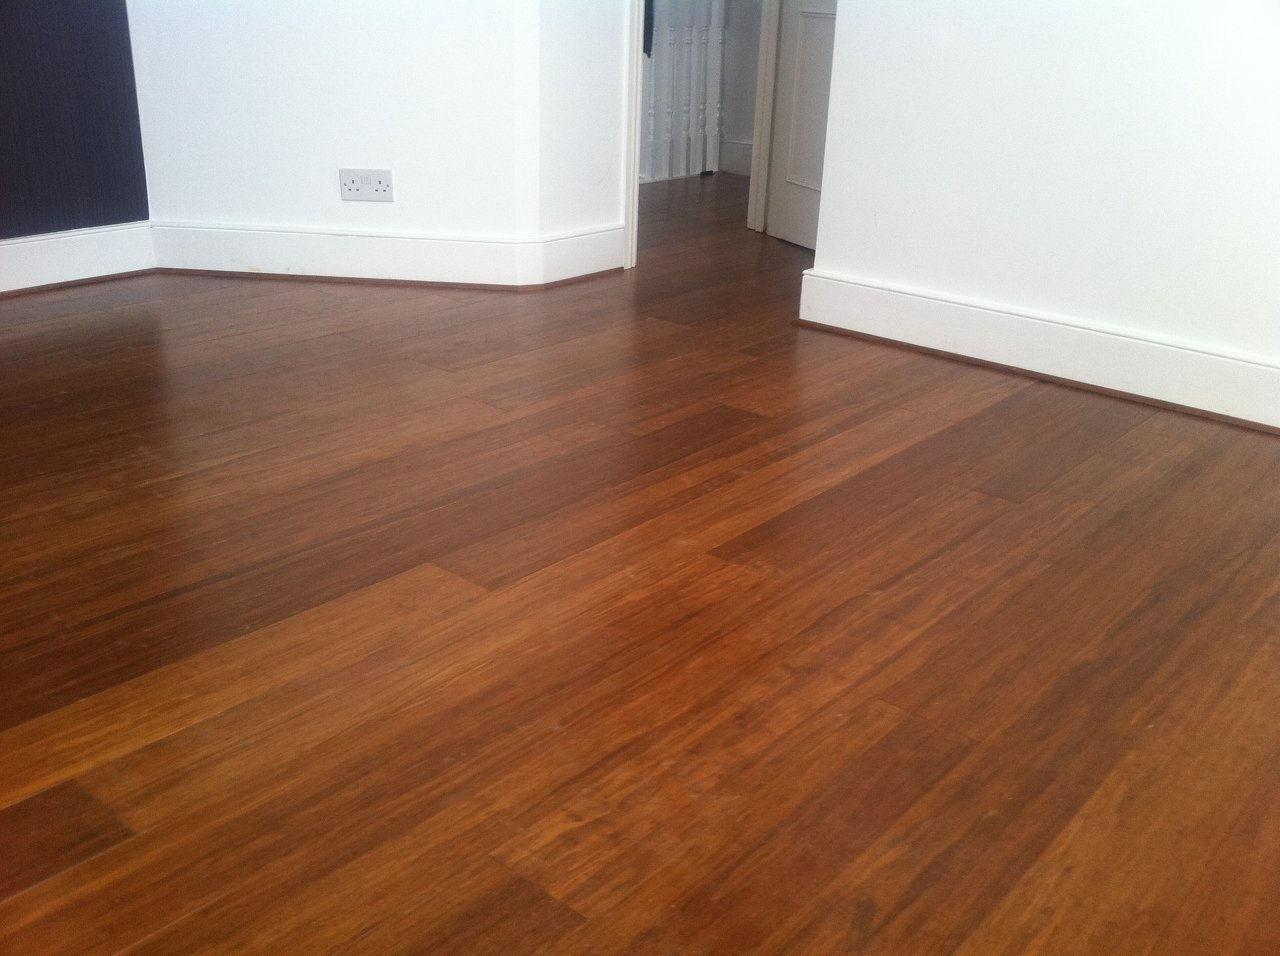 The london wood flooring co - Bamboo Solid Floor